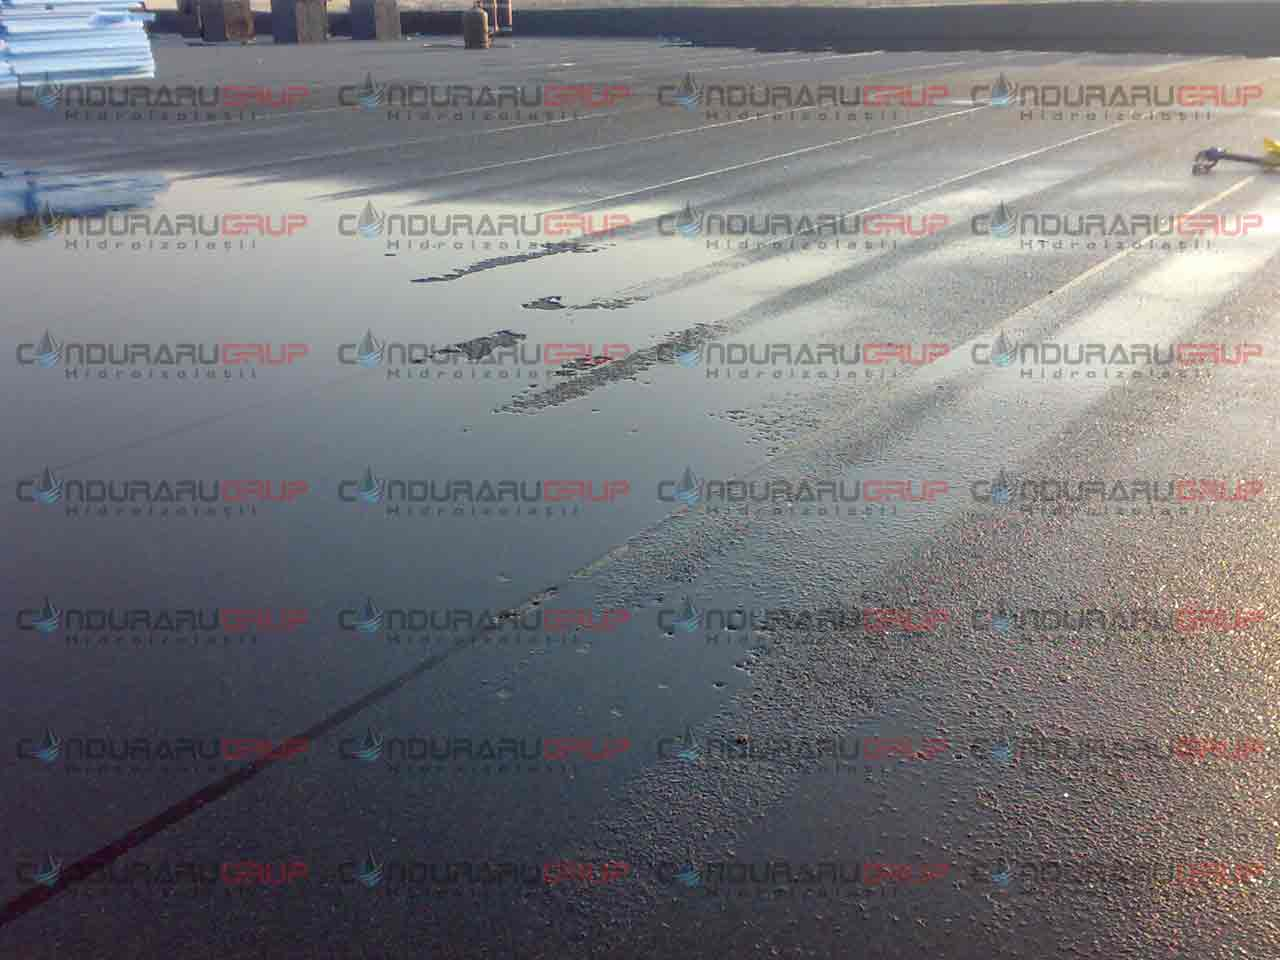 Sediu birouri si productie Soprex CONDURARU GRUP - Poza 12